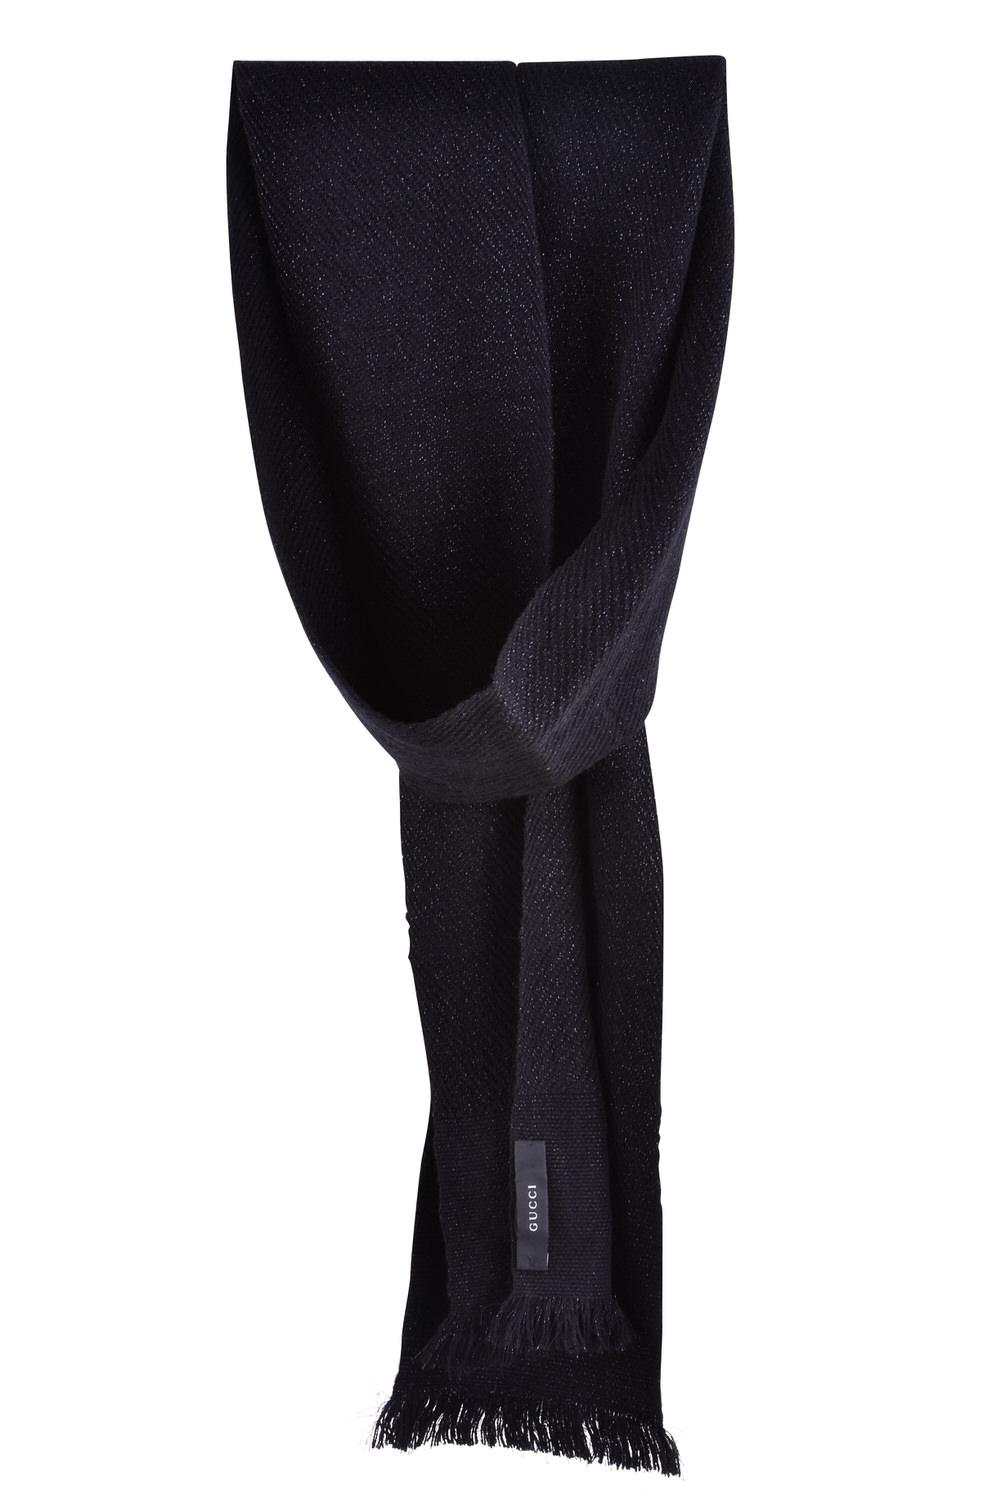 gucci scarf wool 216 cm x 13 5 cm ebay. Black Bedroom Furniture Sets. Home Design Ideas